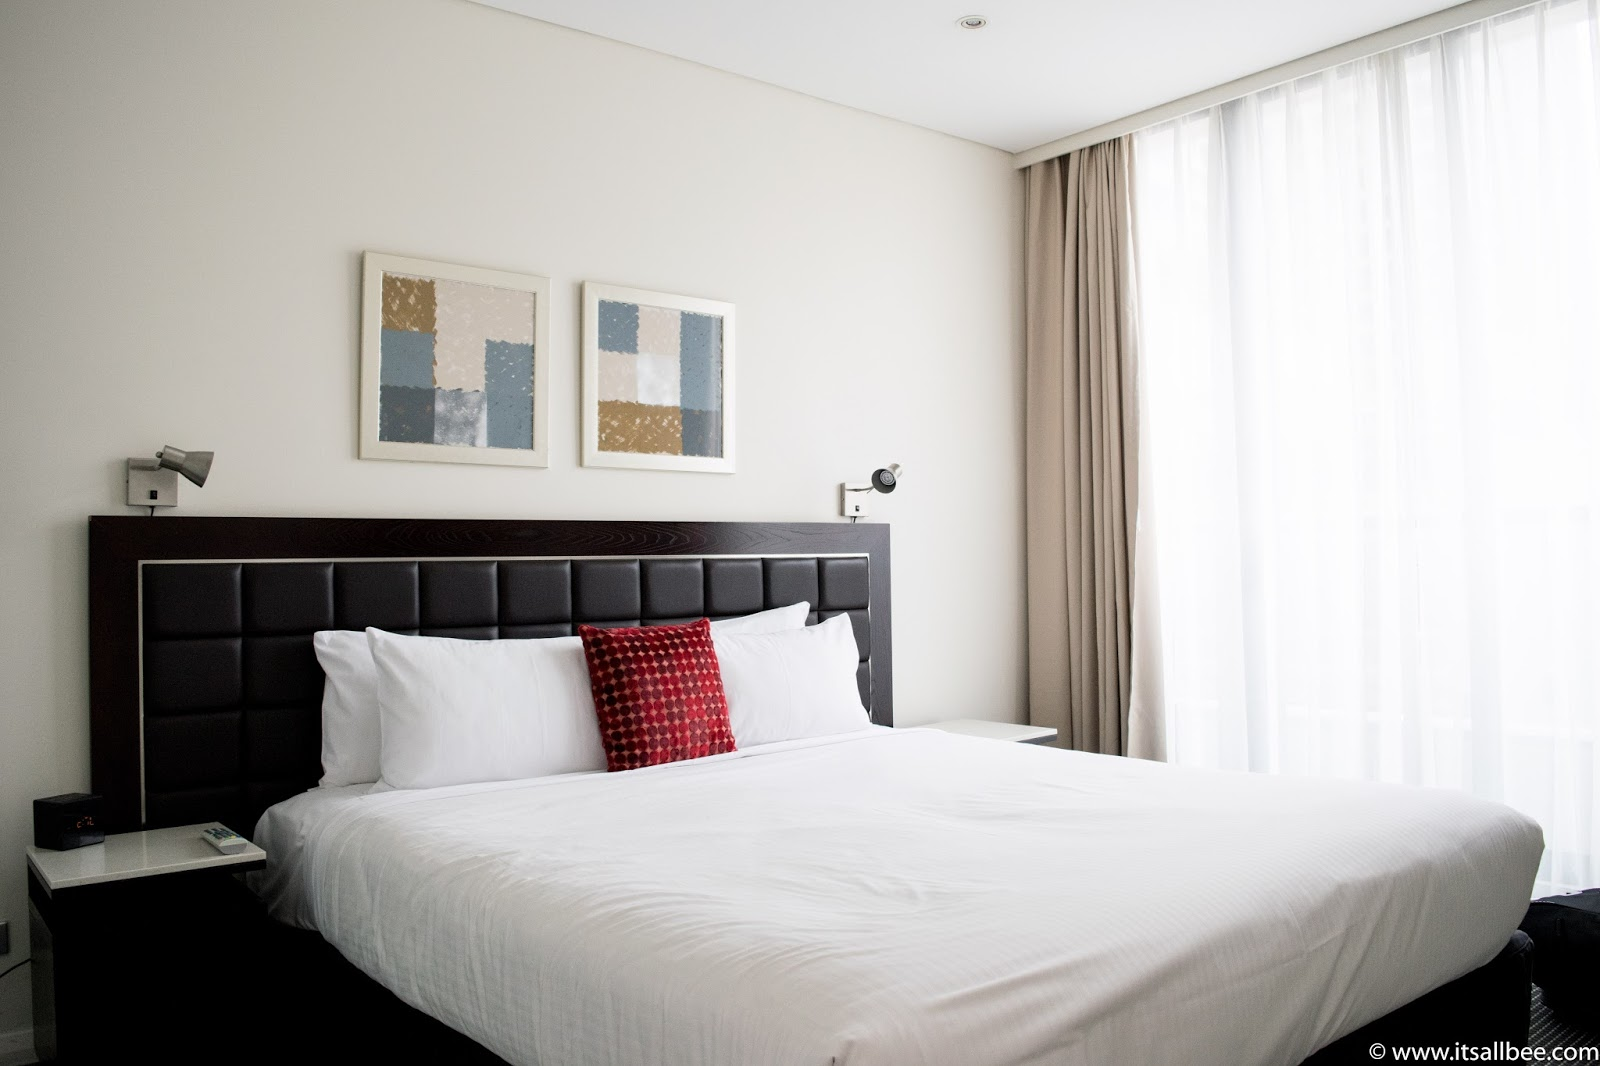 Sydney Hotel apartment